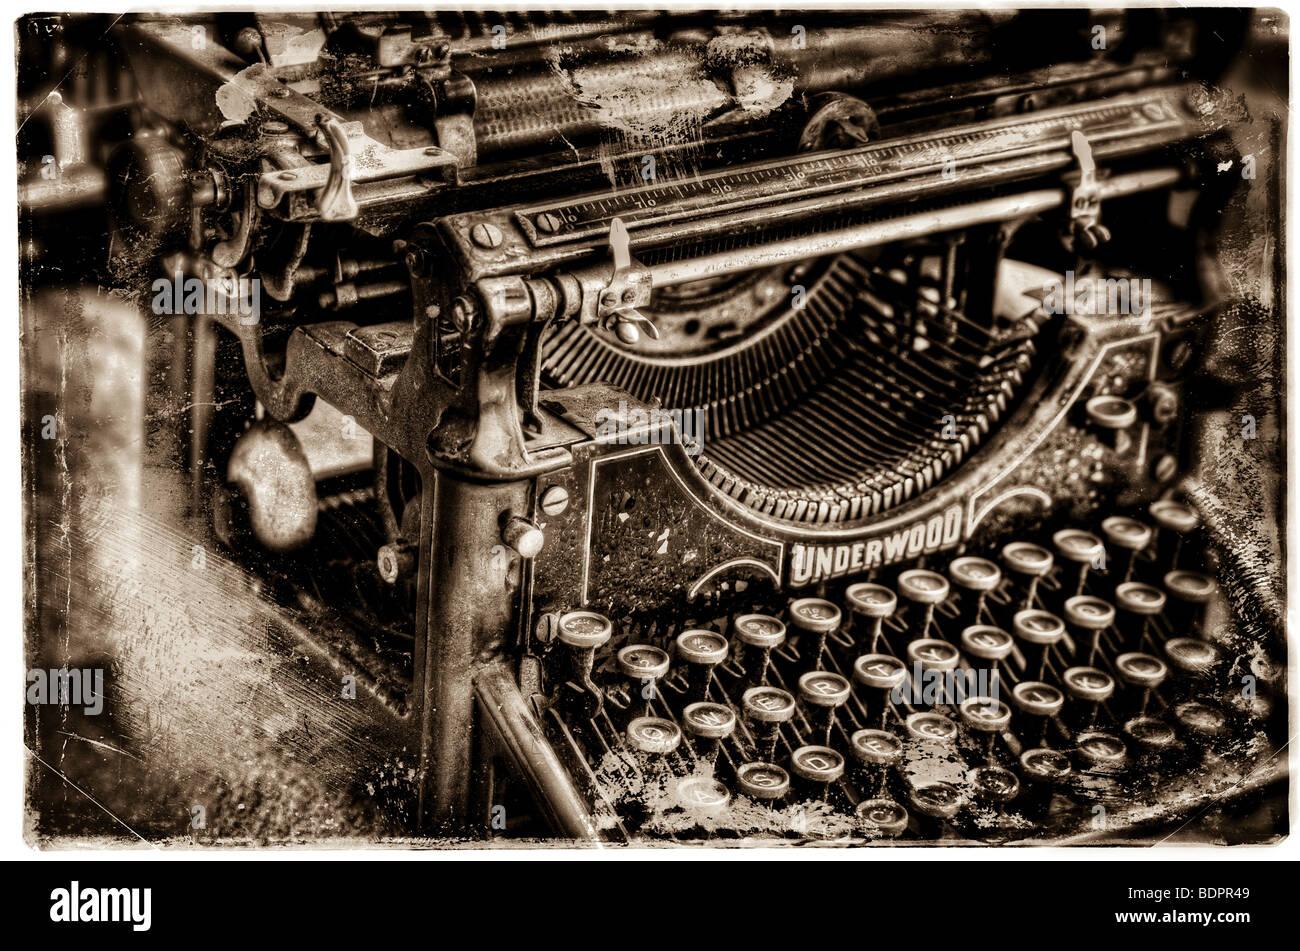 An old fashioned Underwood typewriter - Stock Image